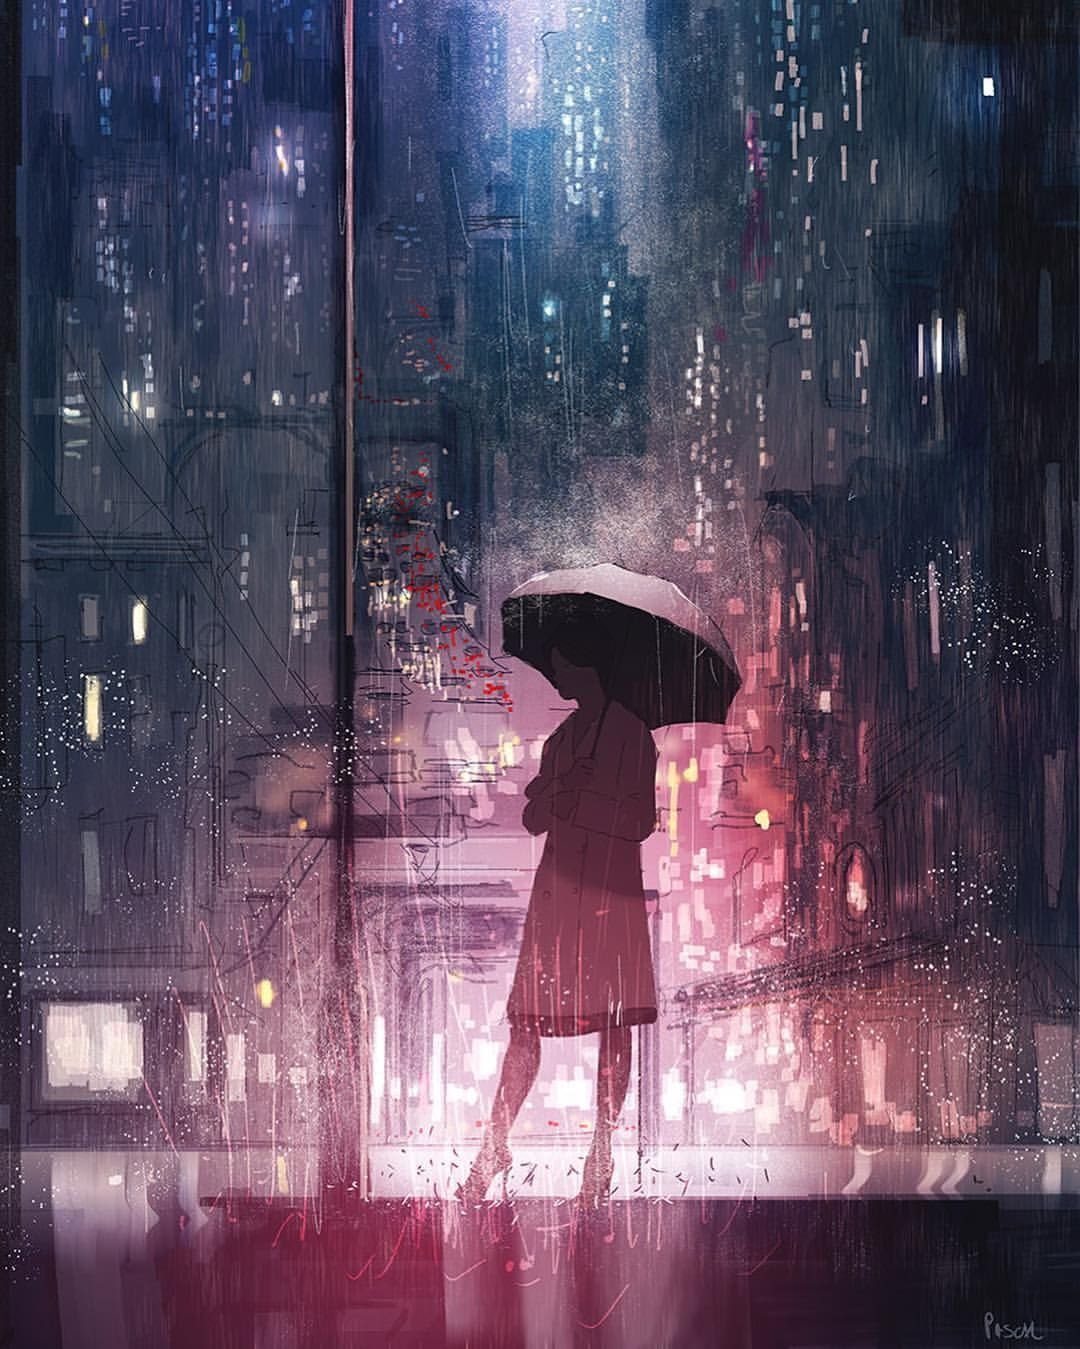 6 Anime Backgrounds Night Rain In 2020 Anime Scenery Rain Wallpapers Open Art